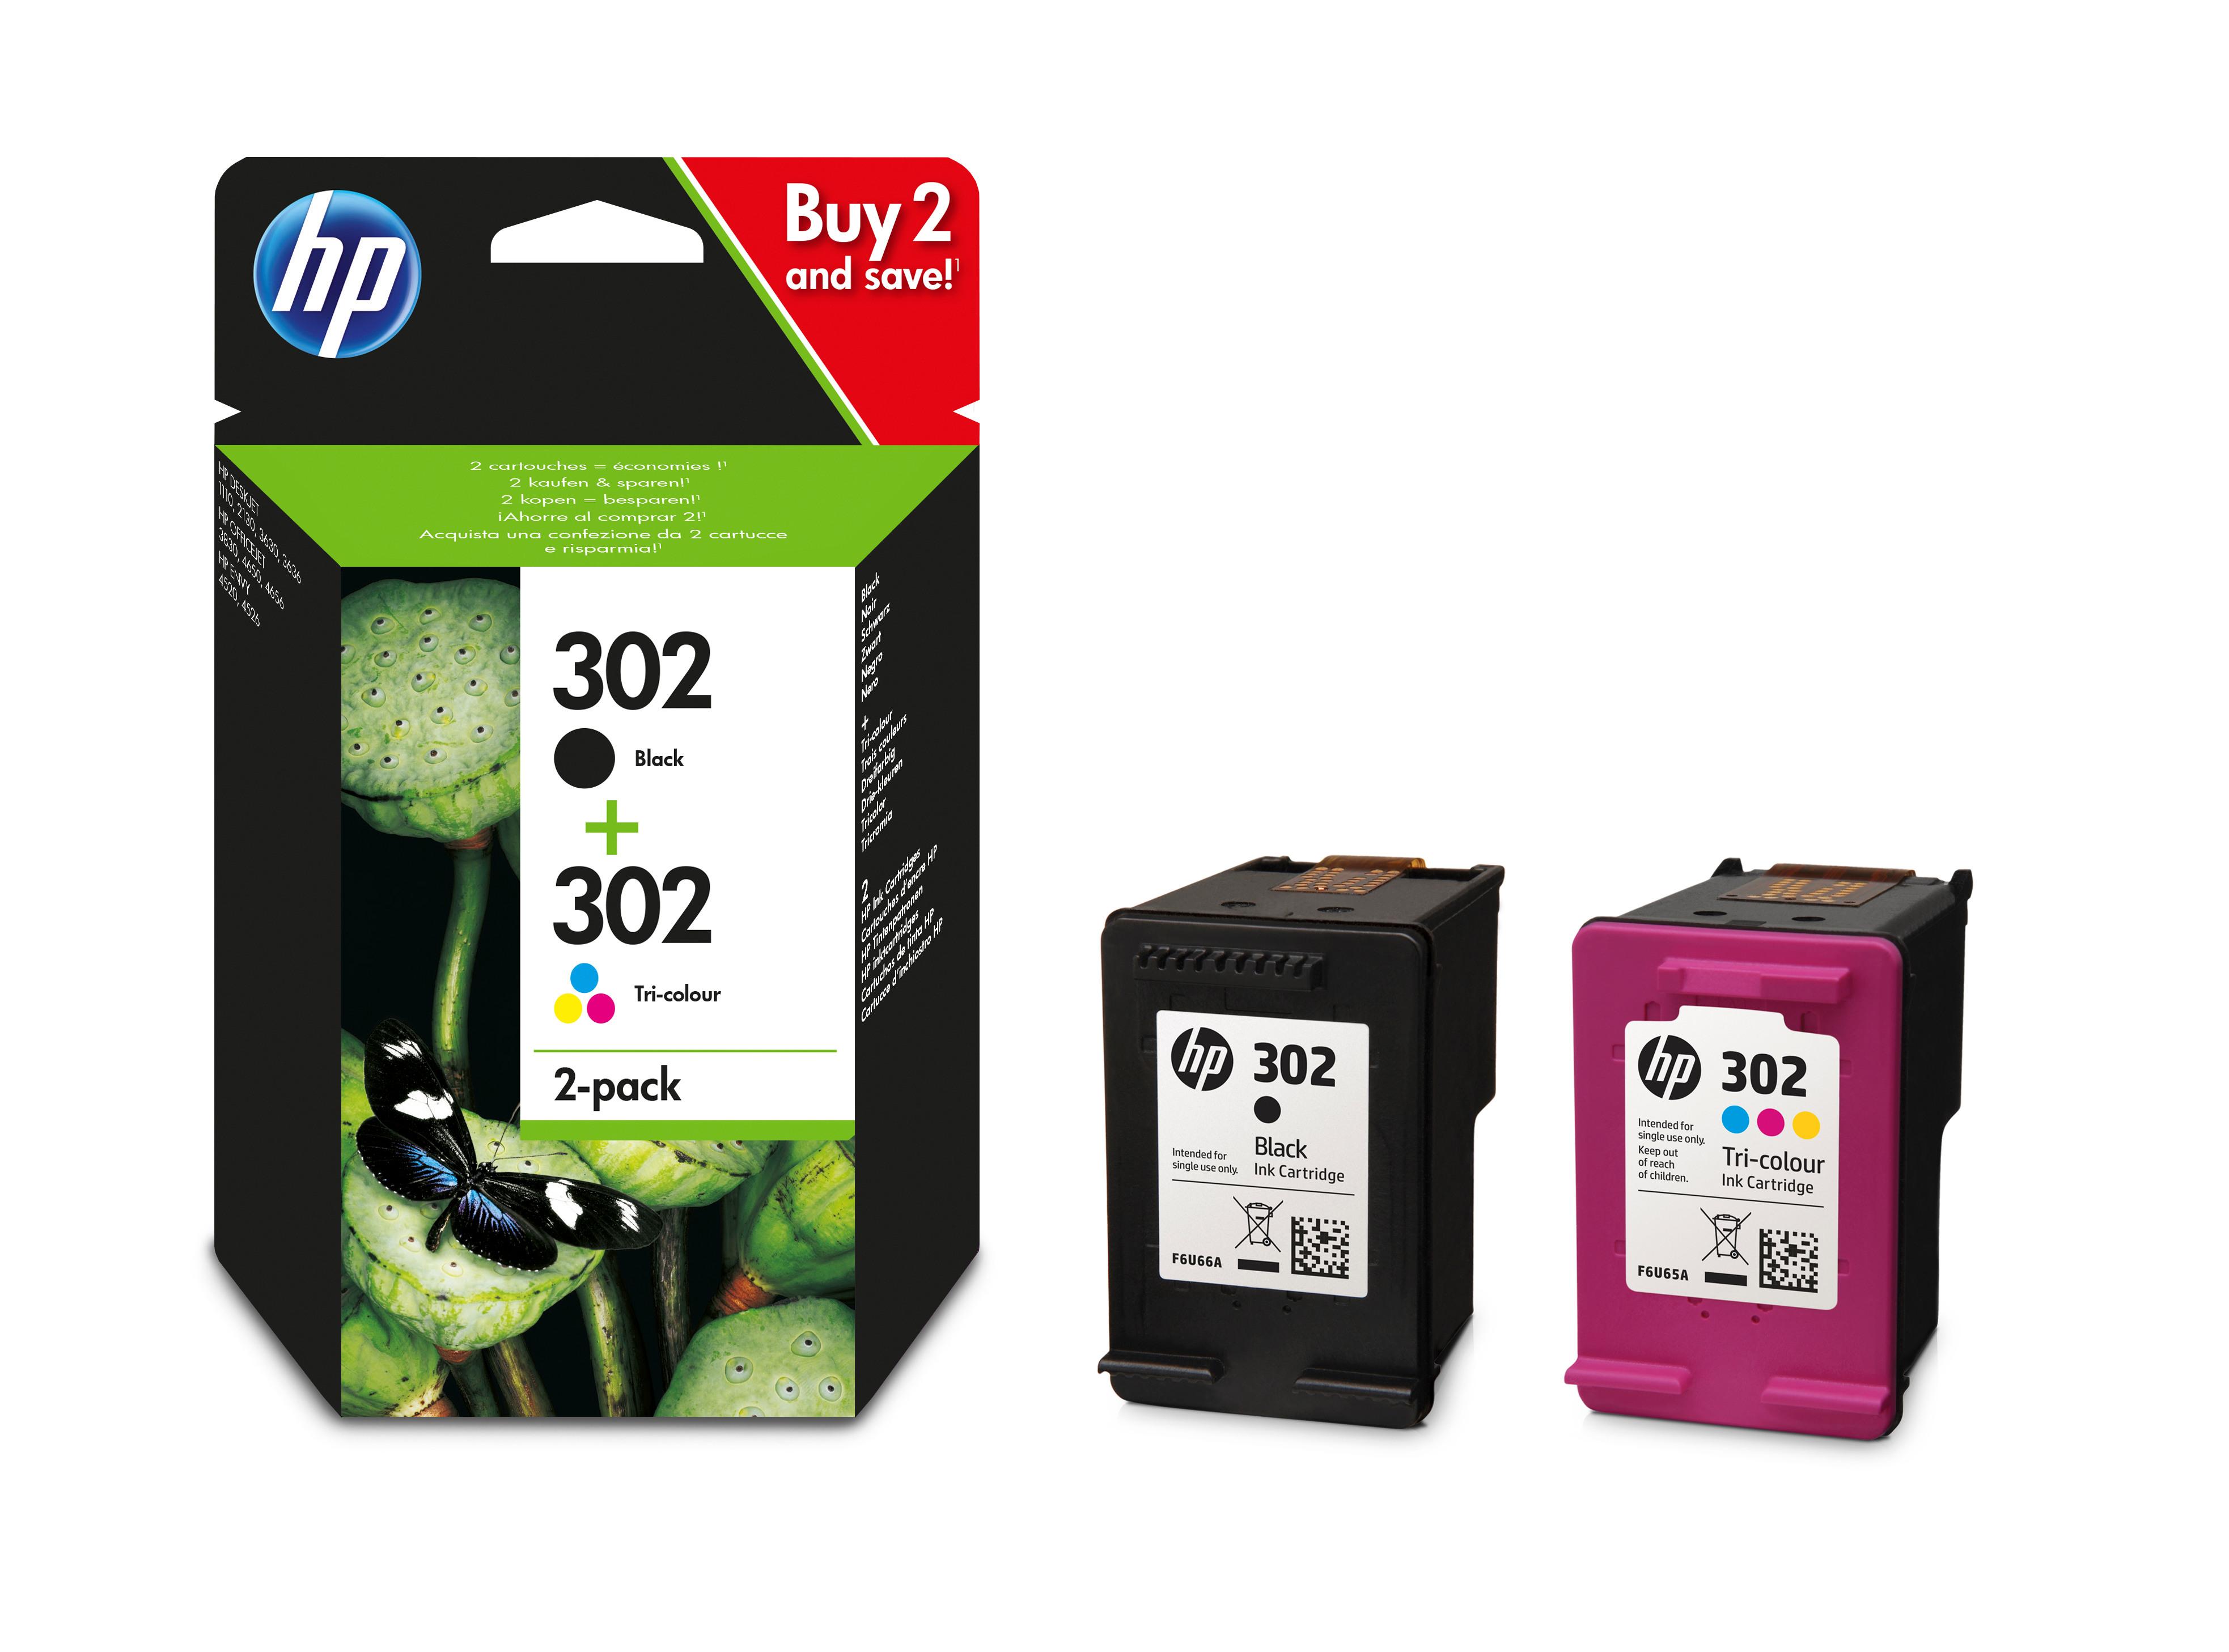 HP Combopack 302 BK/color X4D37AE OfficeJet 3830 190/165 Seiten